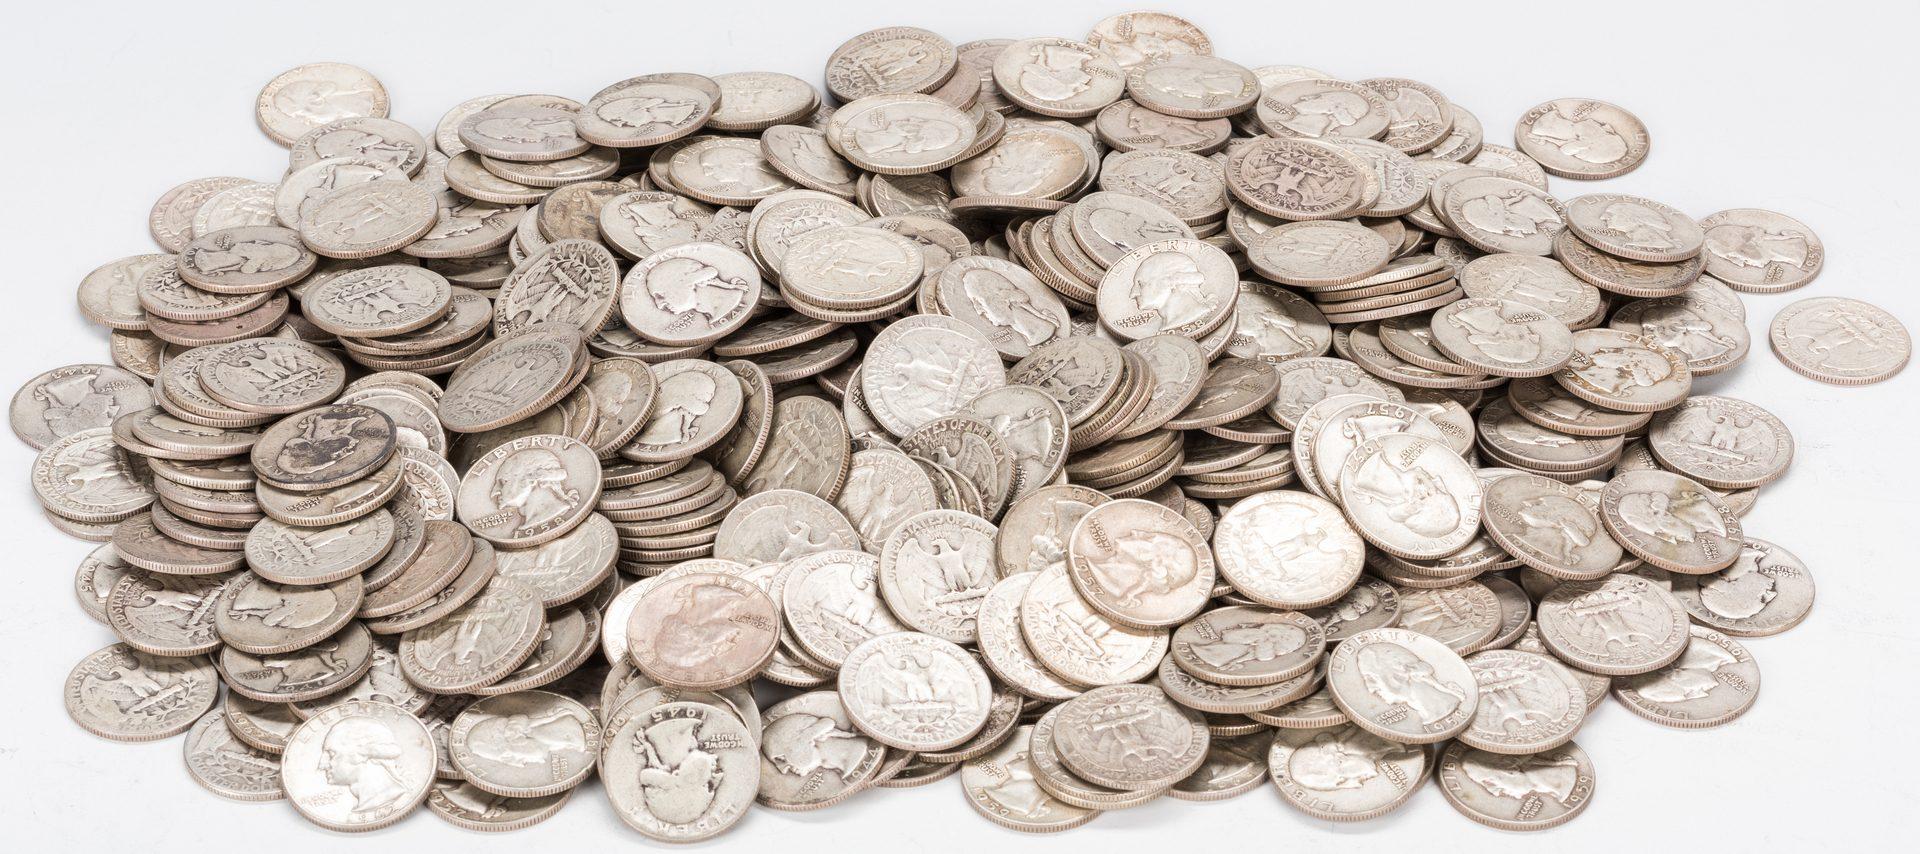 Lot 892: 425 U.S. Washington Silver Quarters (1934-1964)